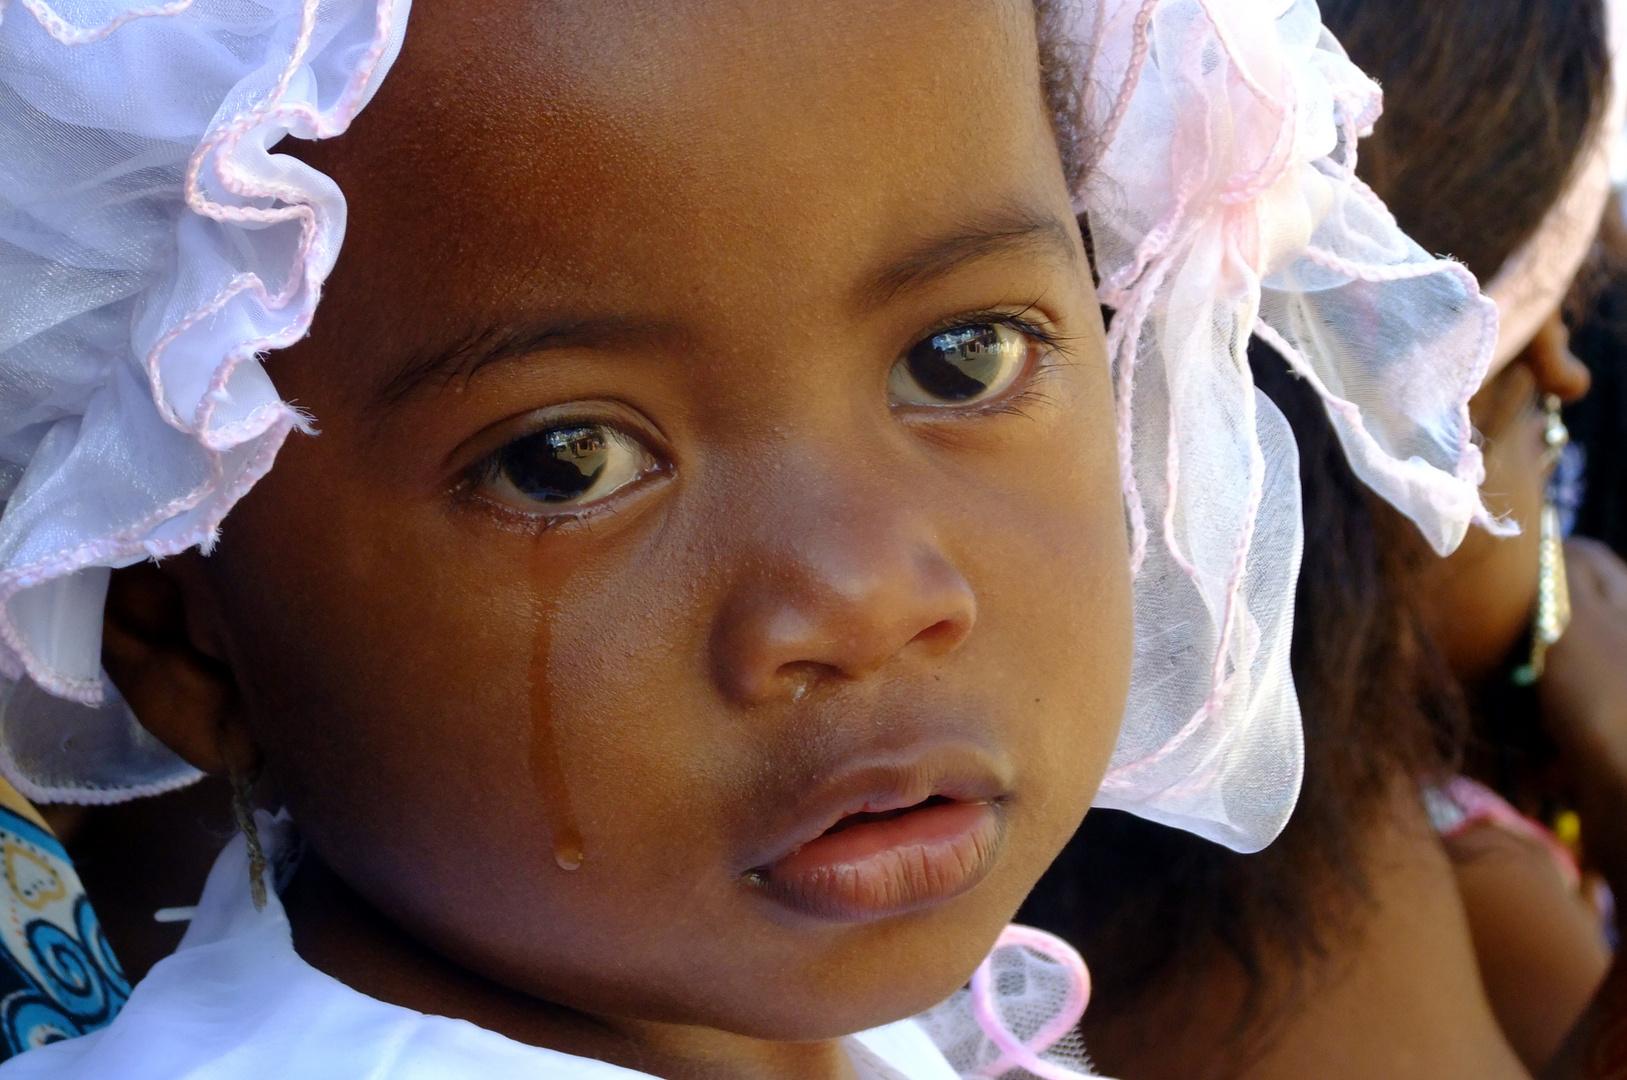 Tears in Mada